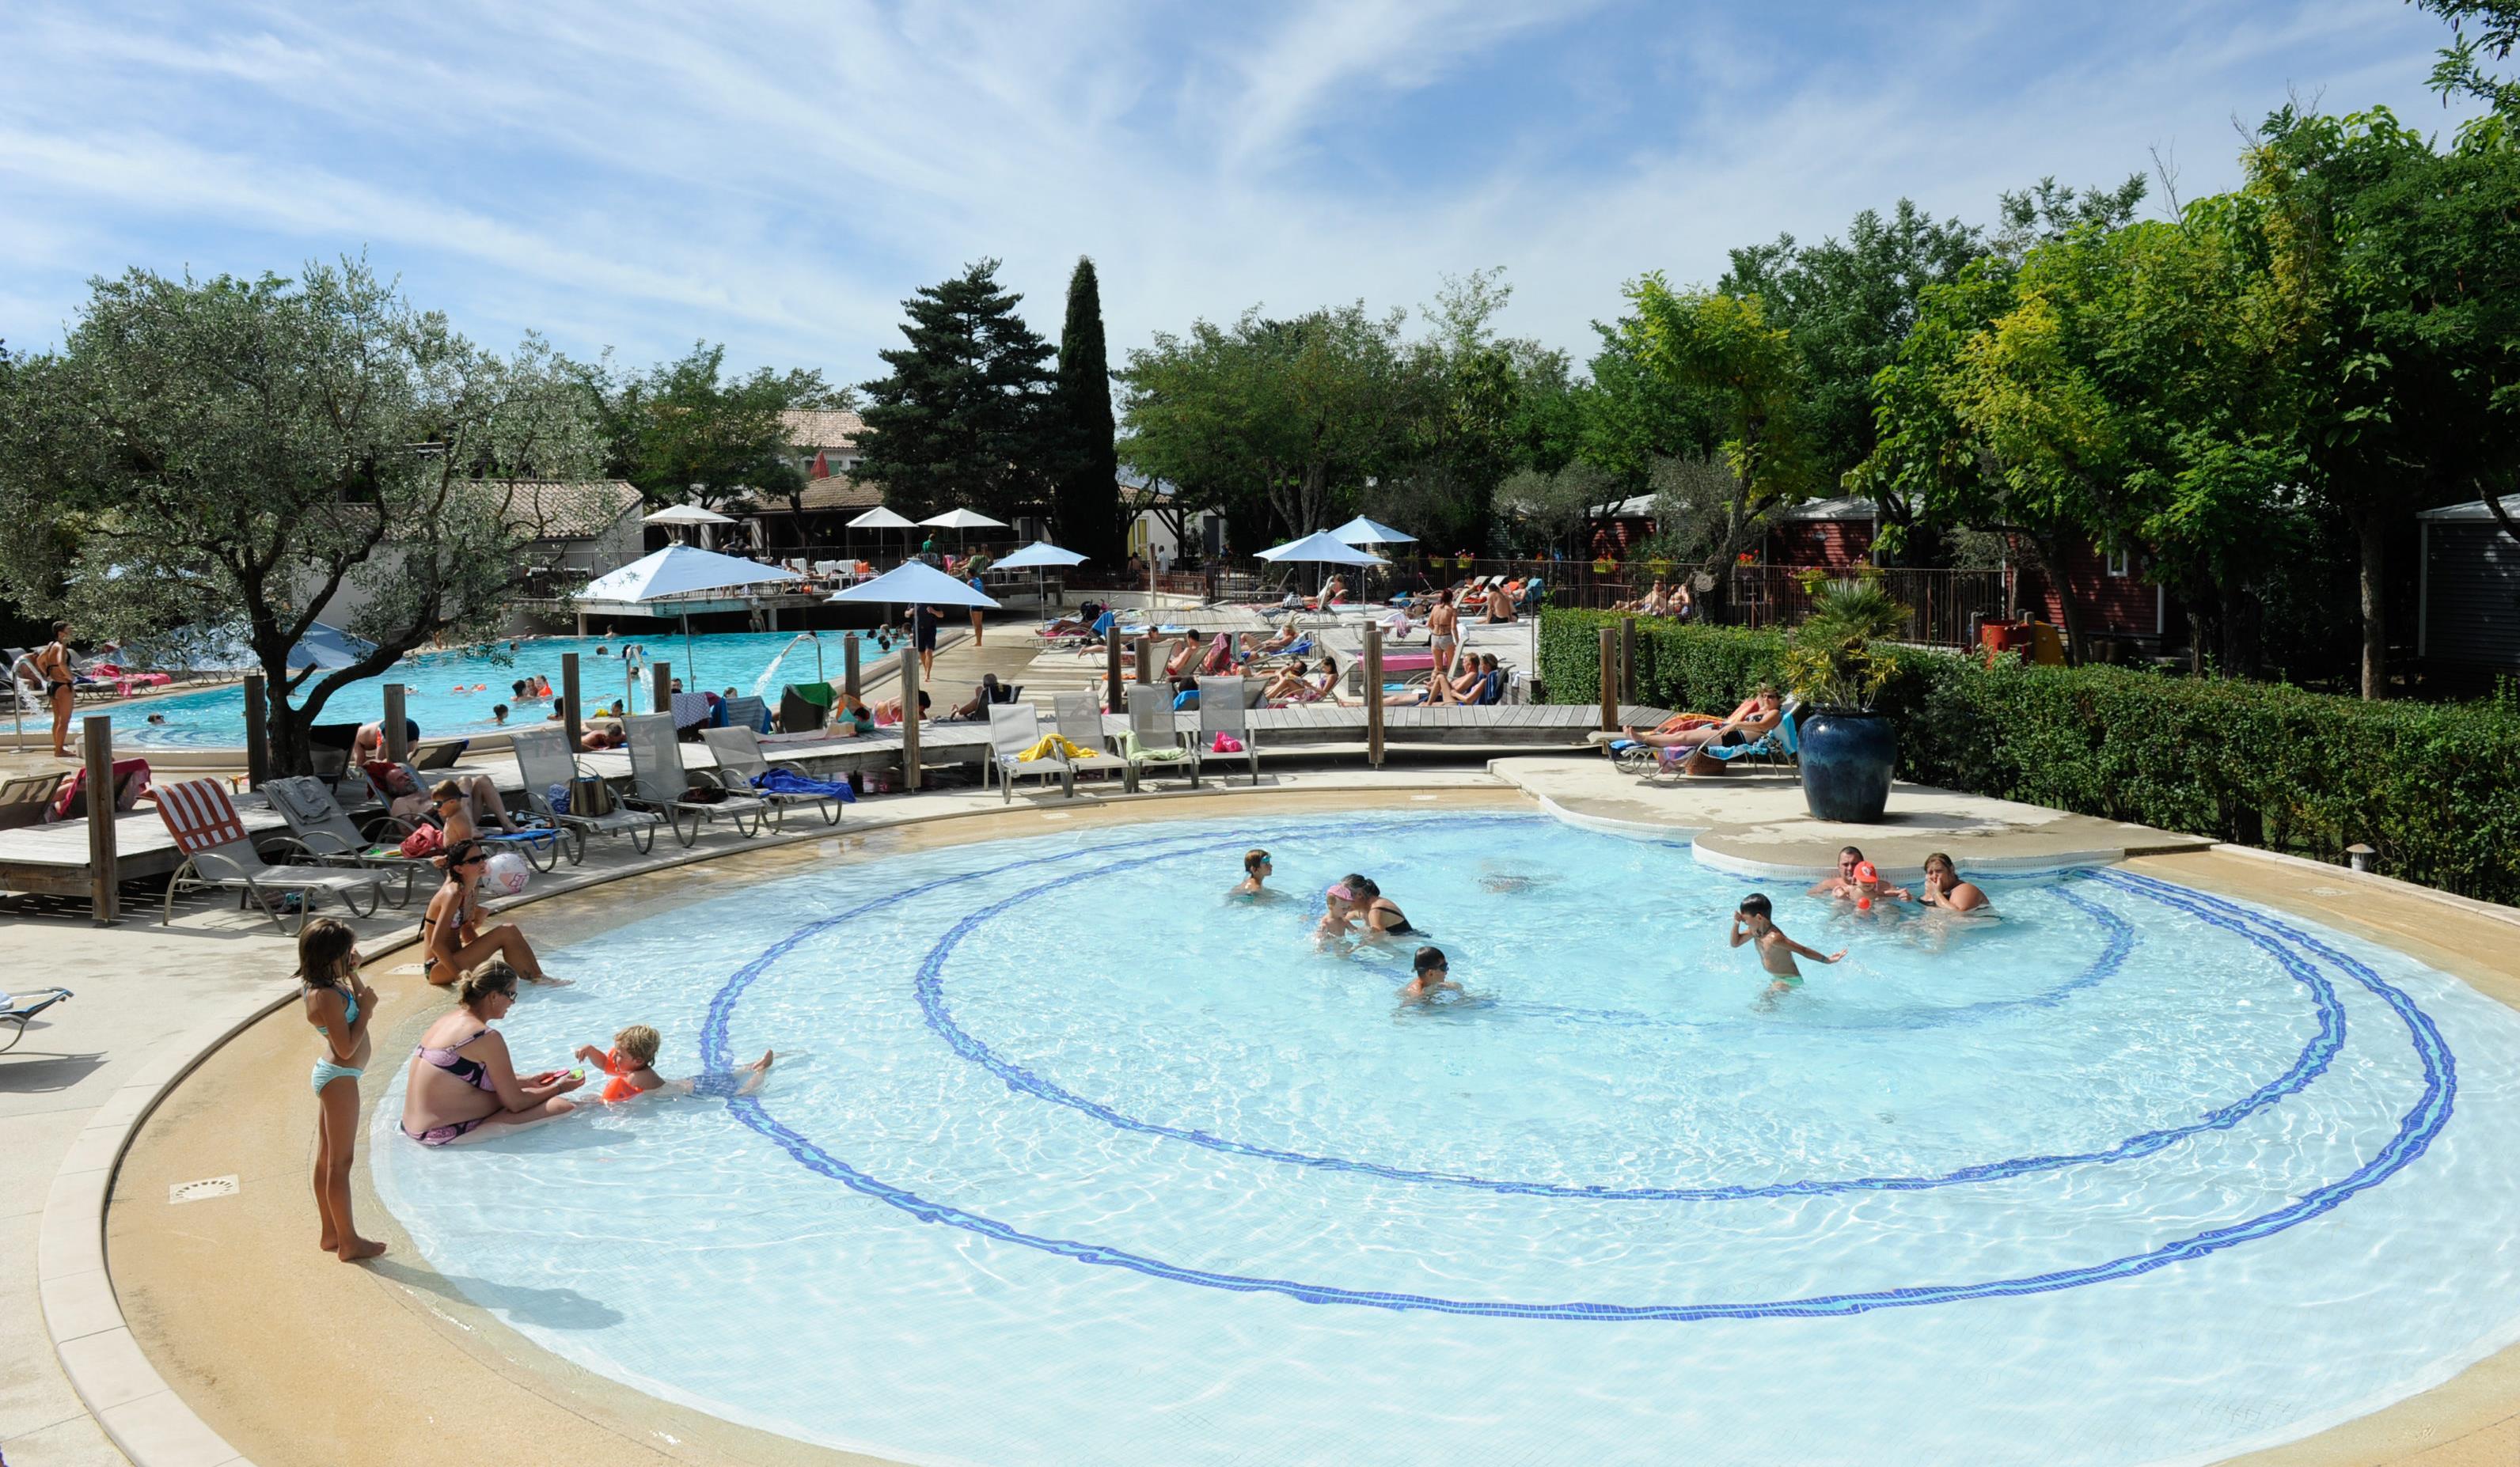 Camping ardeche avec piscine et pataugeoires yelloh - Camping albertville avec piscine ...